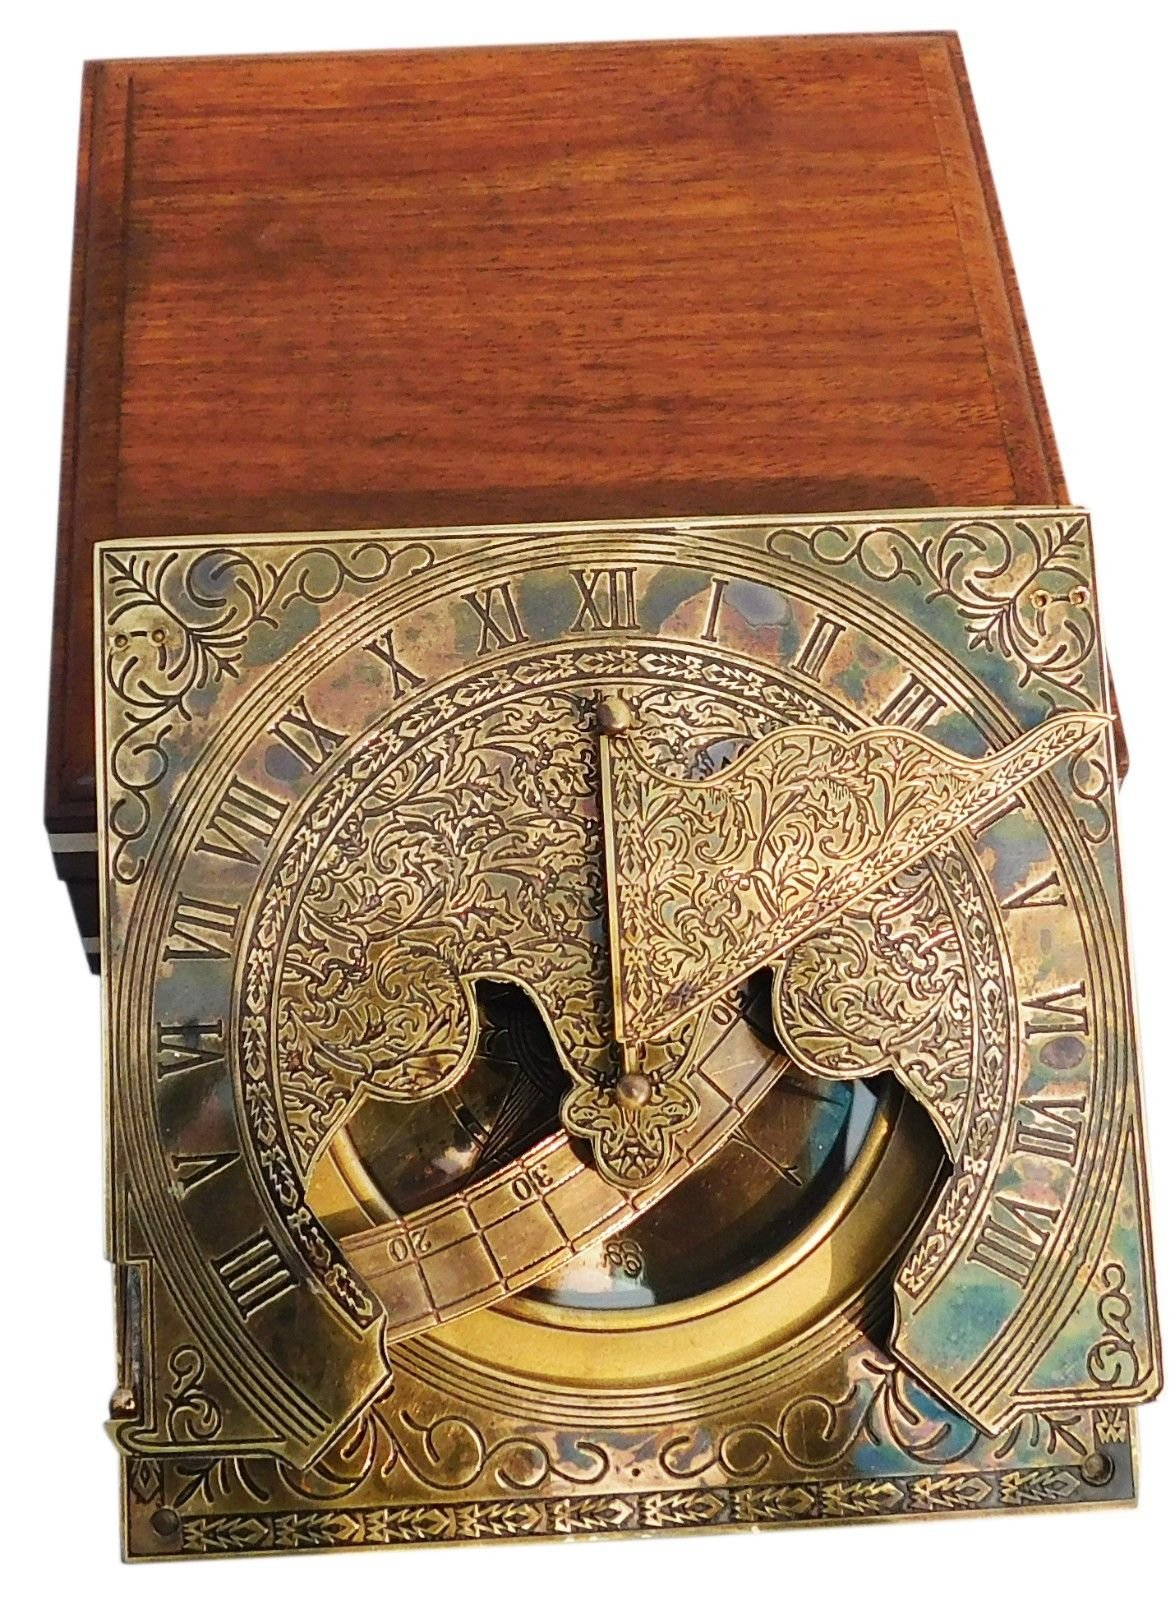 Nautical Style Antique Brass Sundial Compass Nautical Stand Compass With Box by Sara Nautical